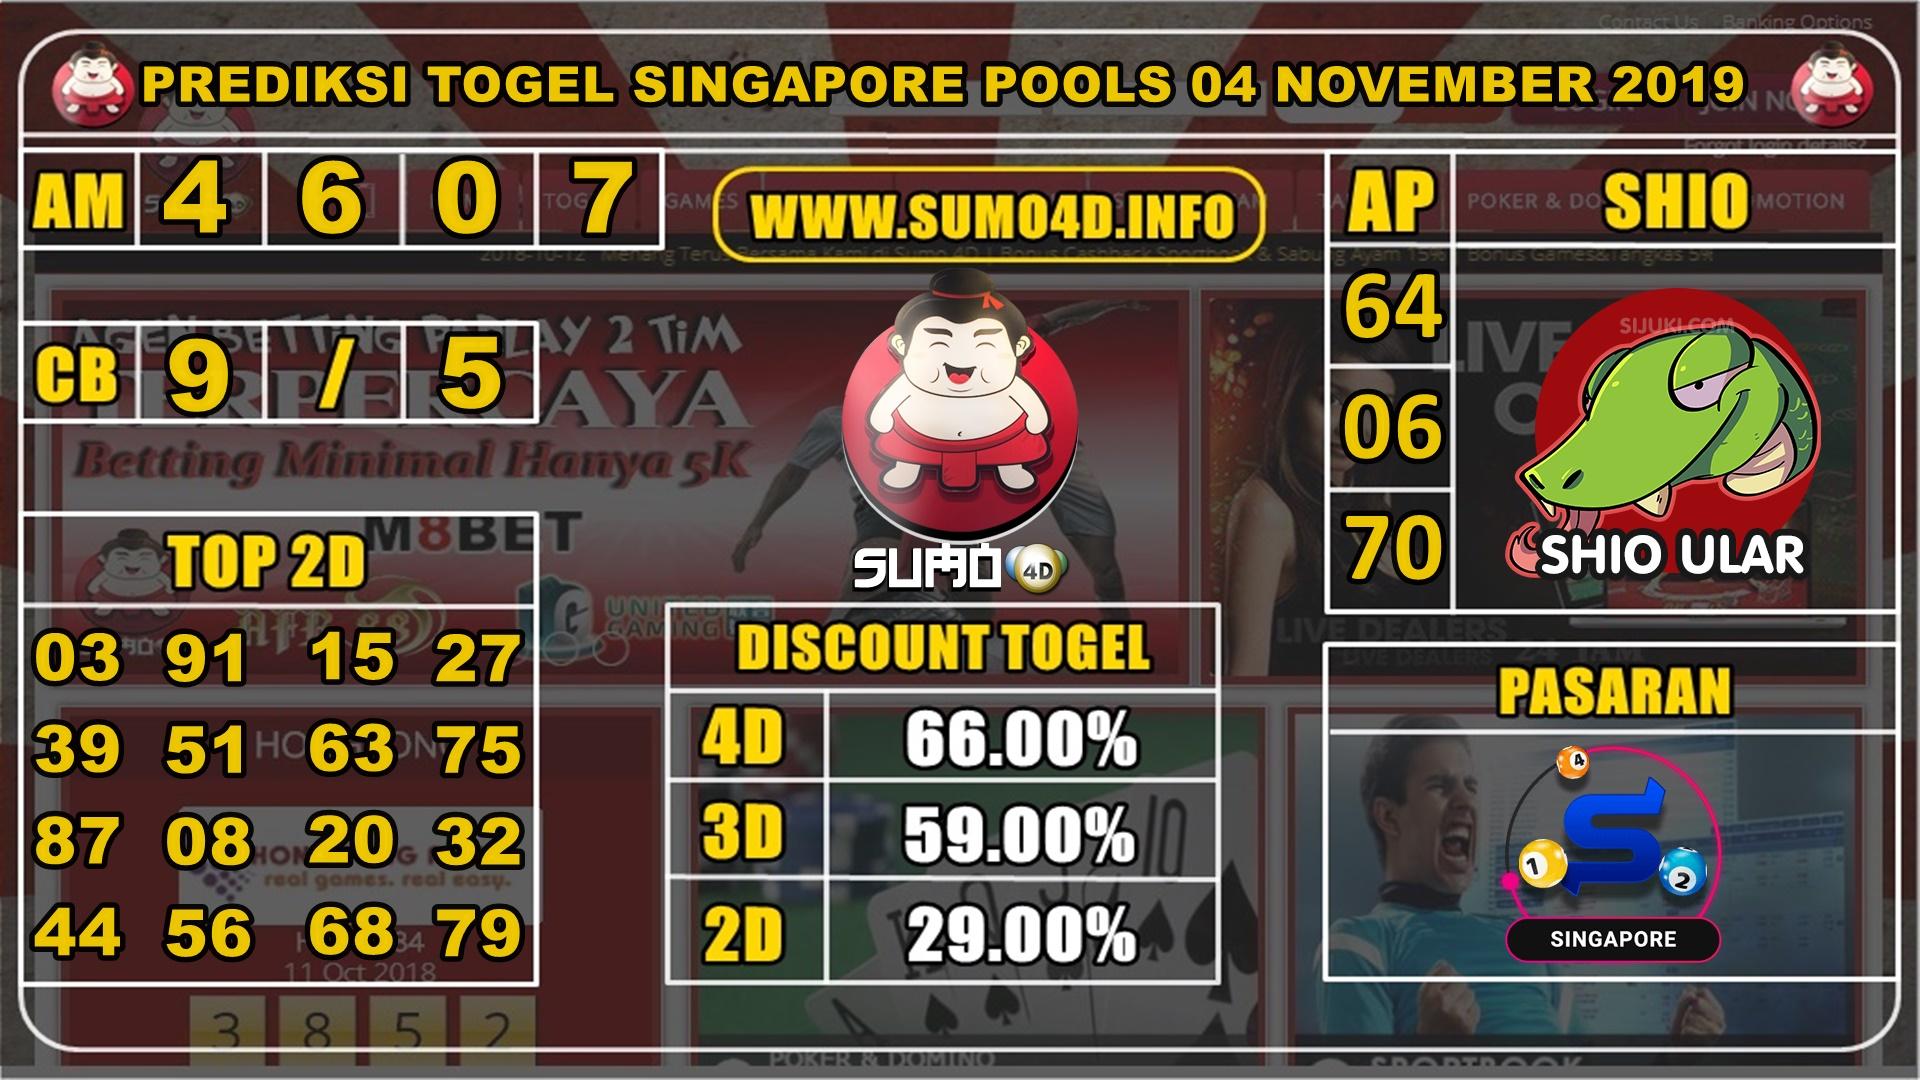 PREDIKSI TOGEL SINGAPORE POOLS 04 NOVEMBER 2019